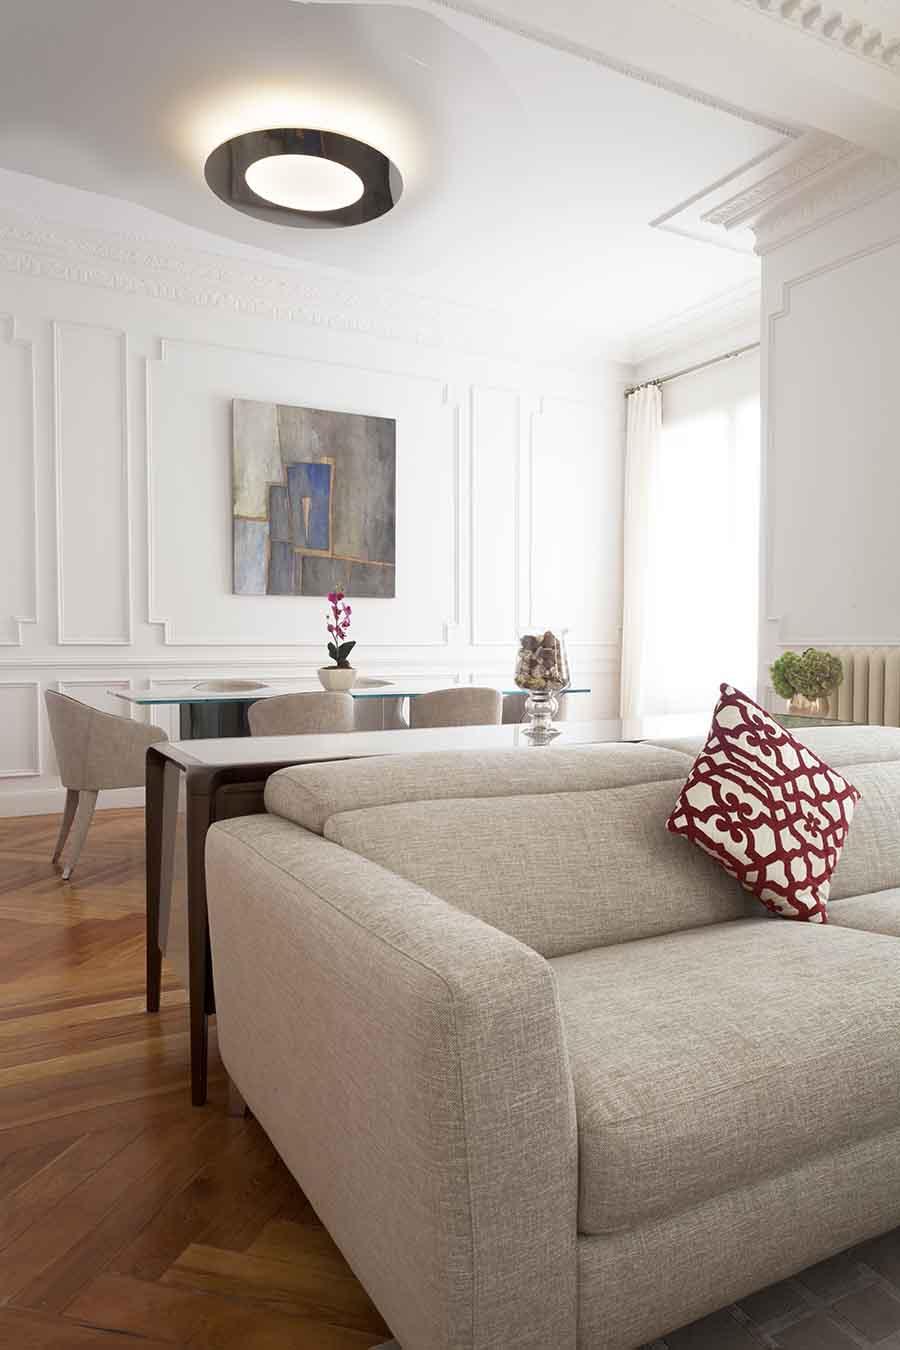 Alfonsoxi07 alicia mesa dise adora de interiores y for Disenadora de interiores